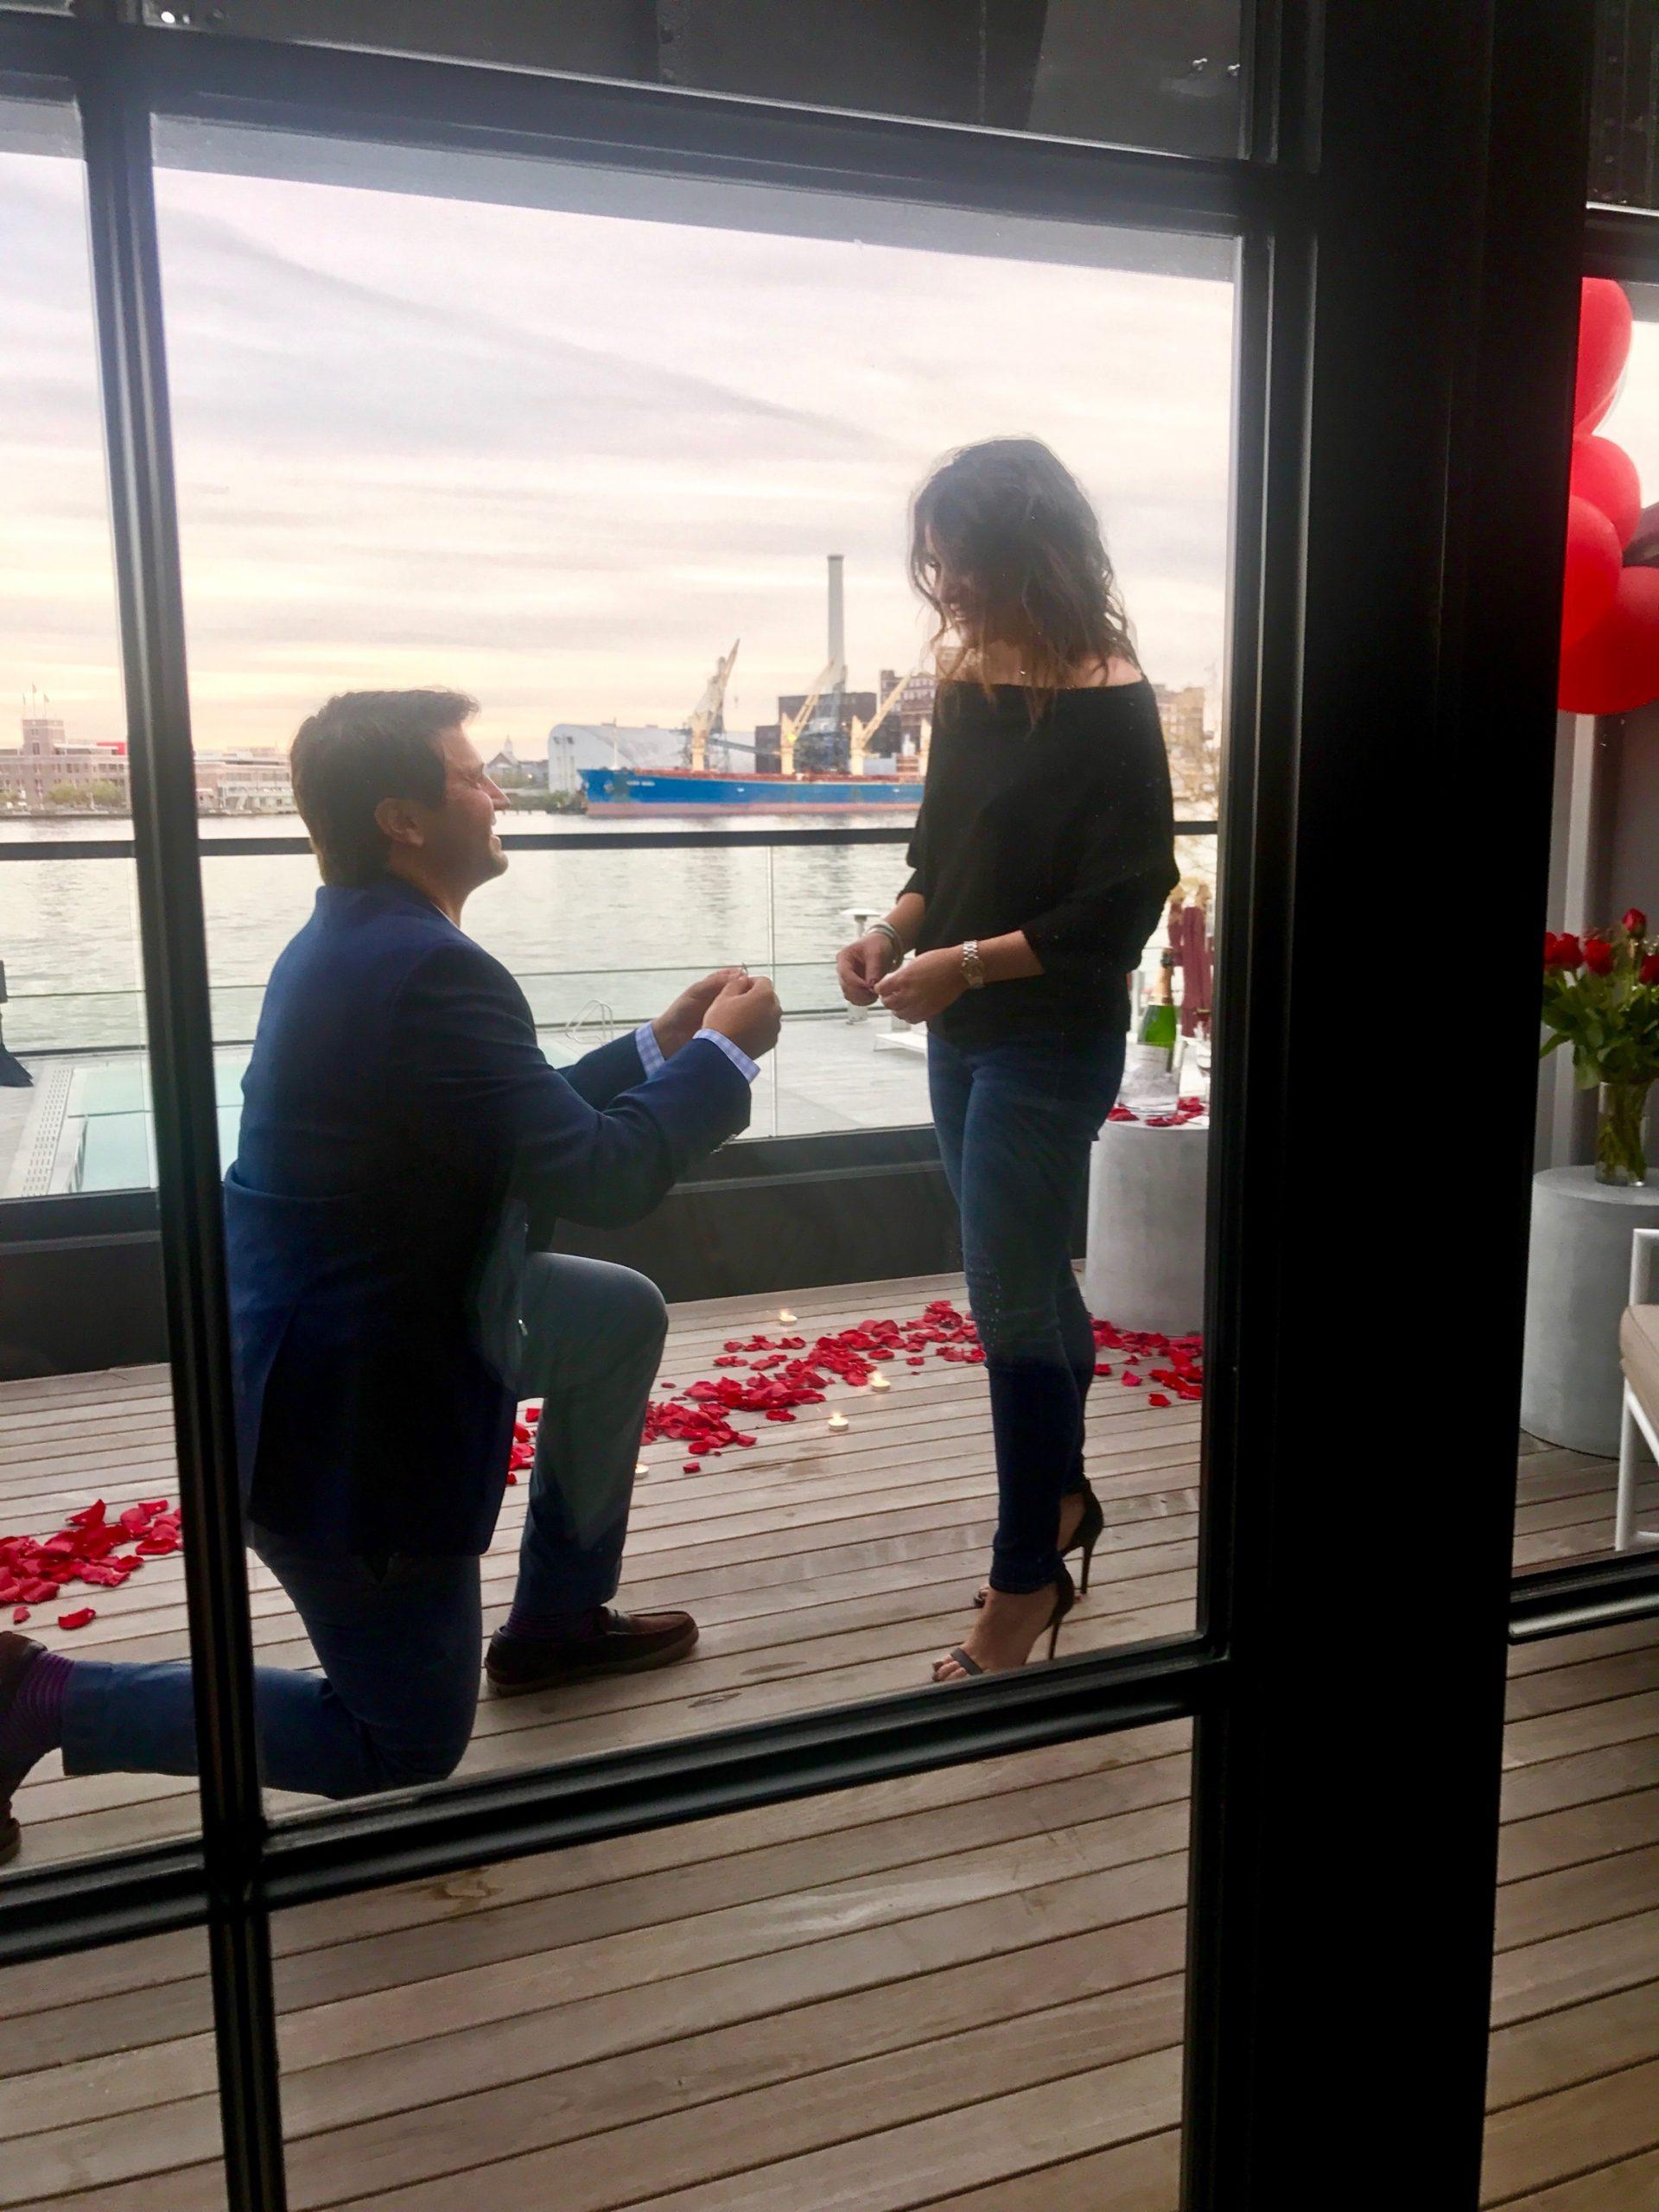 Morgan-and-Michael-Engaged-3.JPG#asset:65430